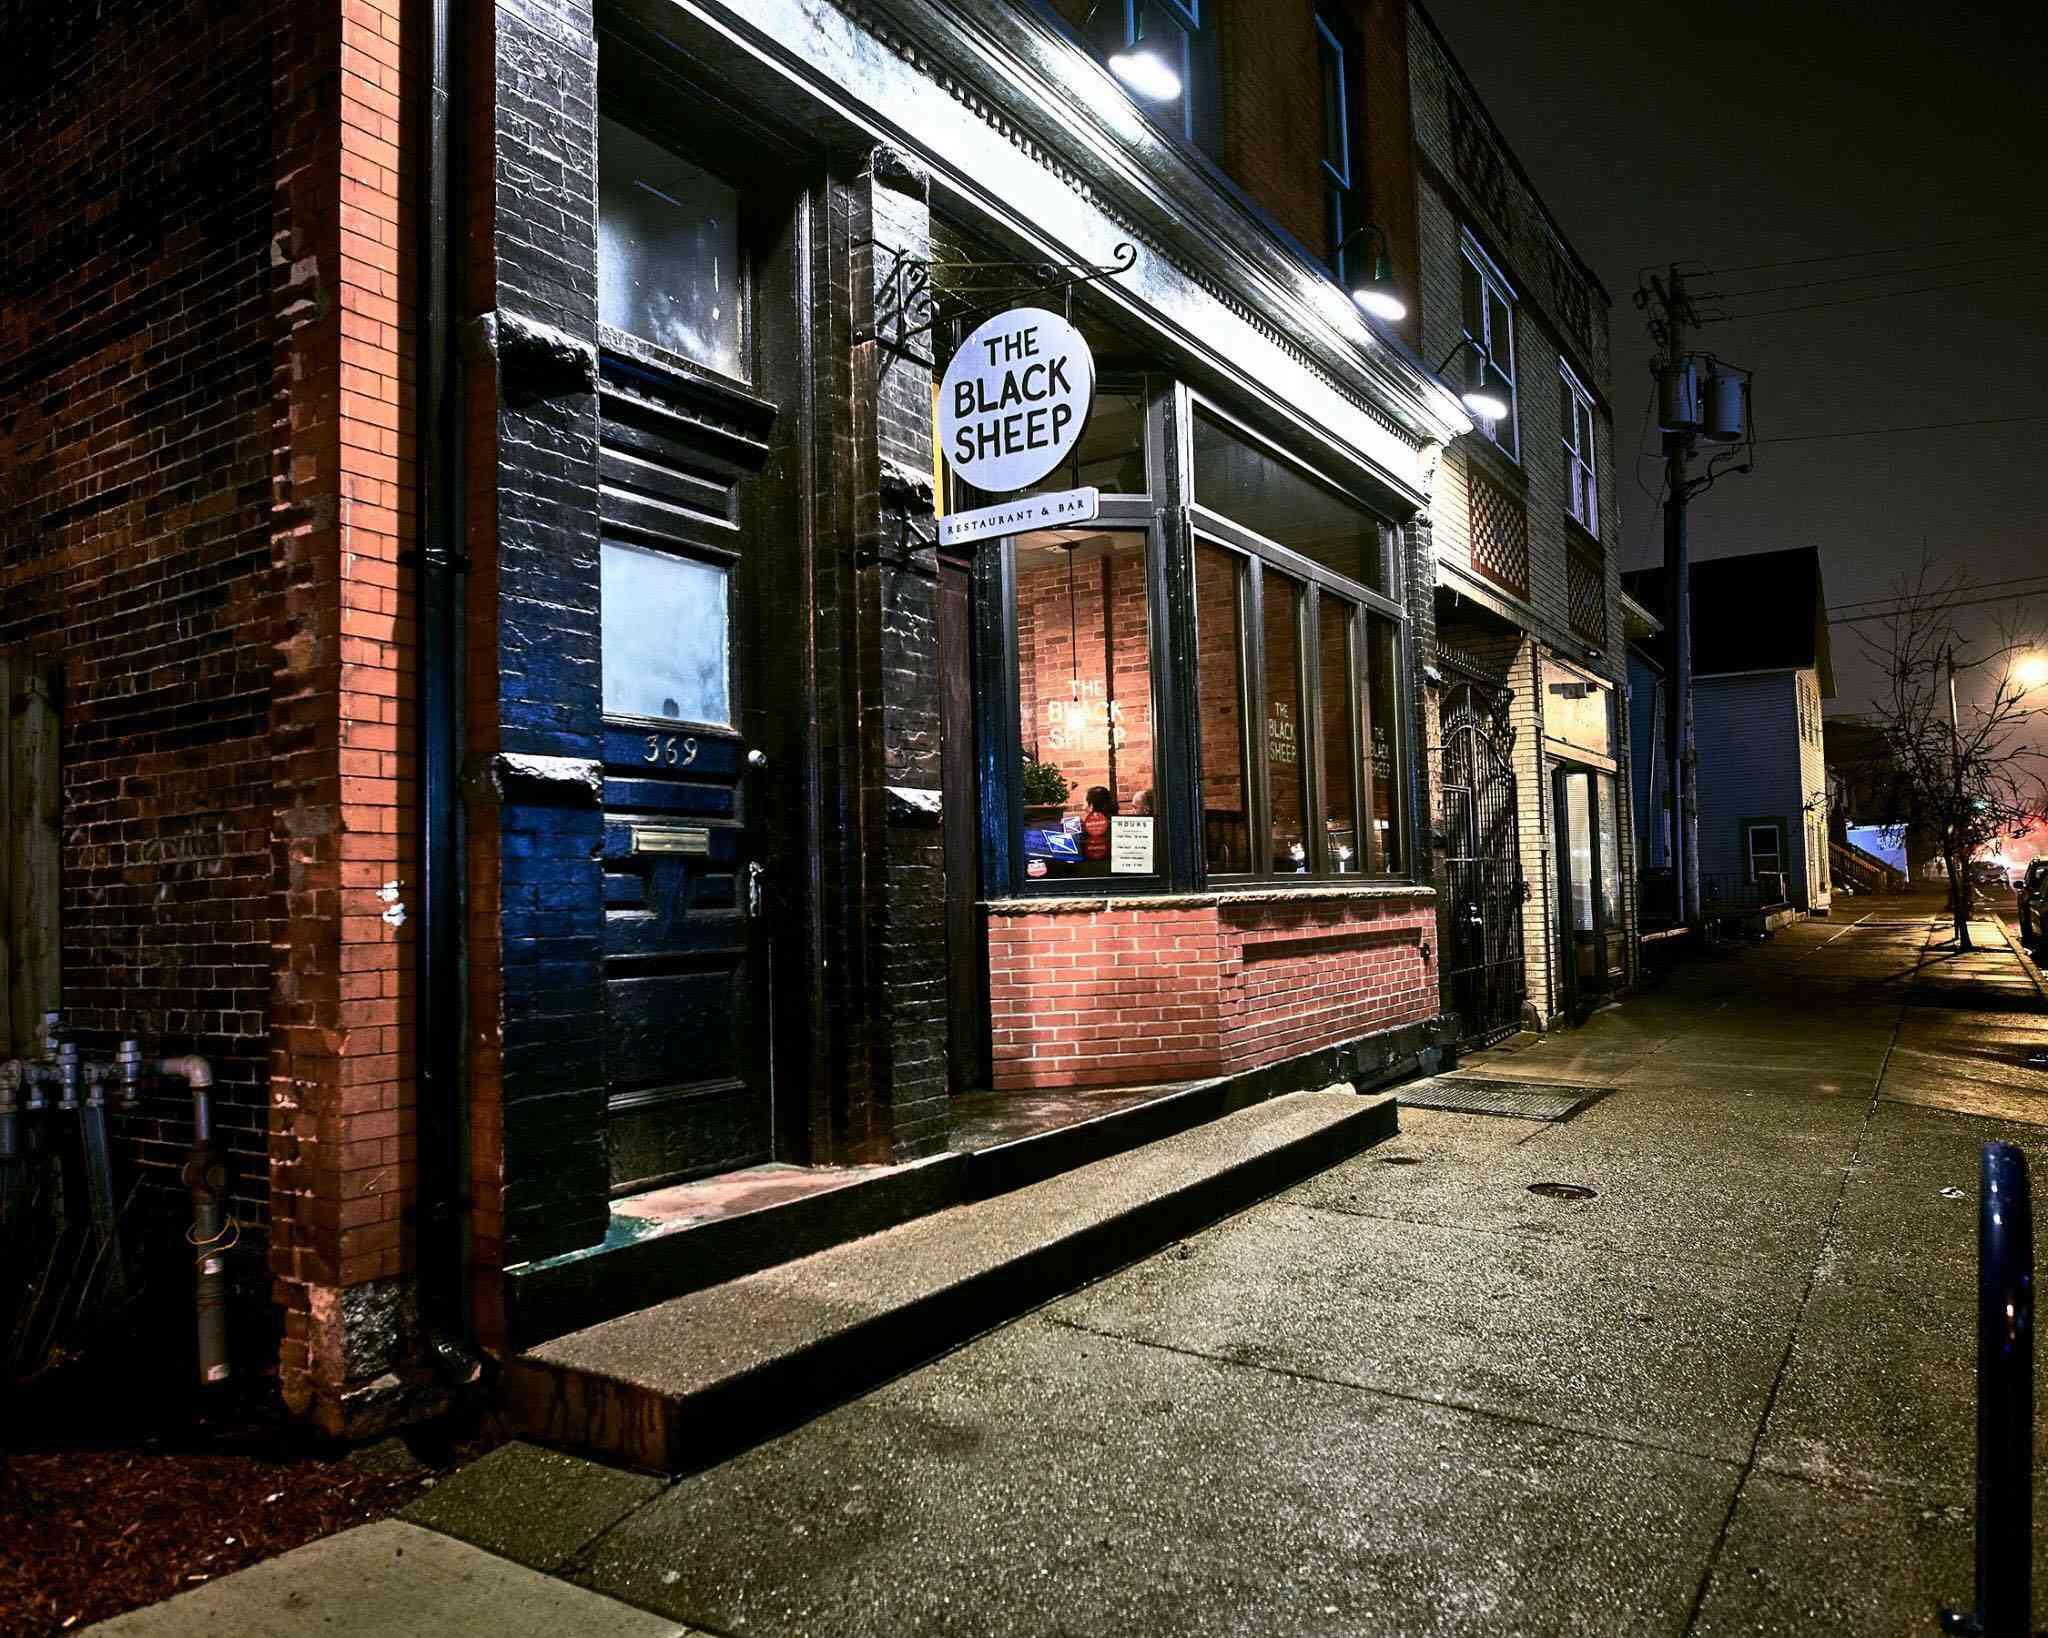 The Black Sheep Bar and Restaurant